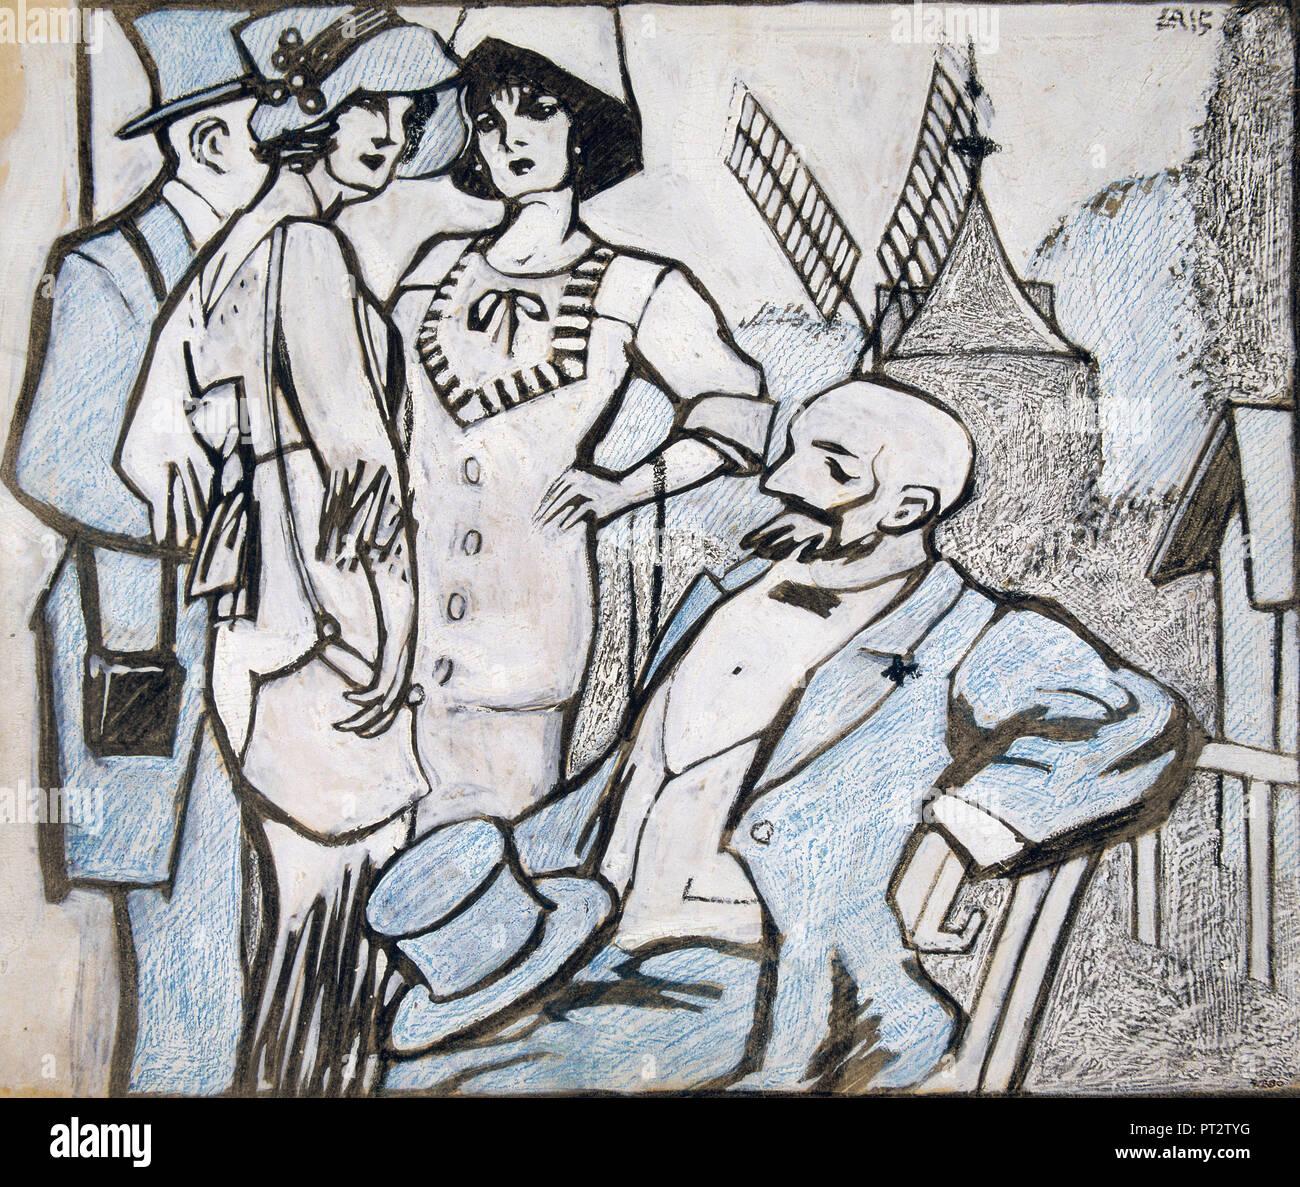 Juan Gris, al Longchamps gare 1913 inchiostro, Gouache e matita colorata su cartoncino, Museu Nacional d'Art de Catalunya, Barcelona, Spagna. Immagini Stock